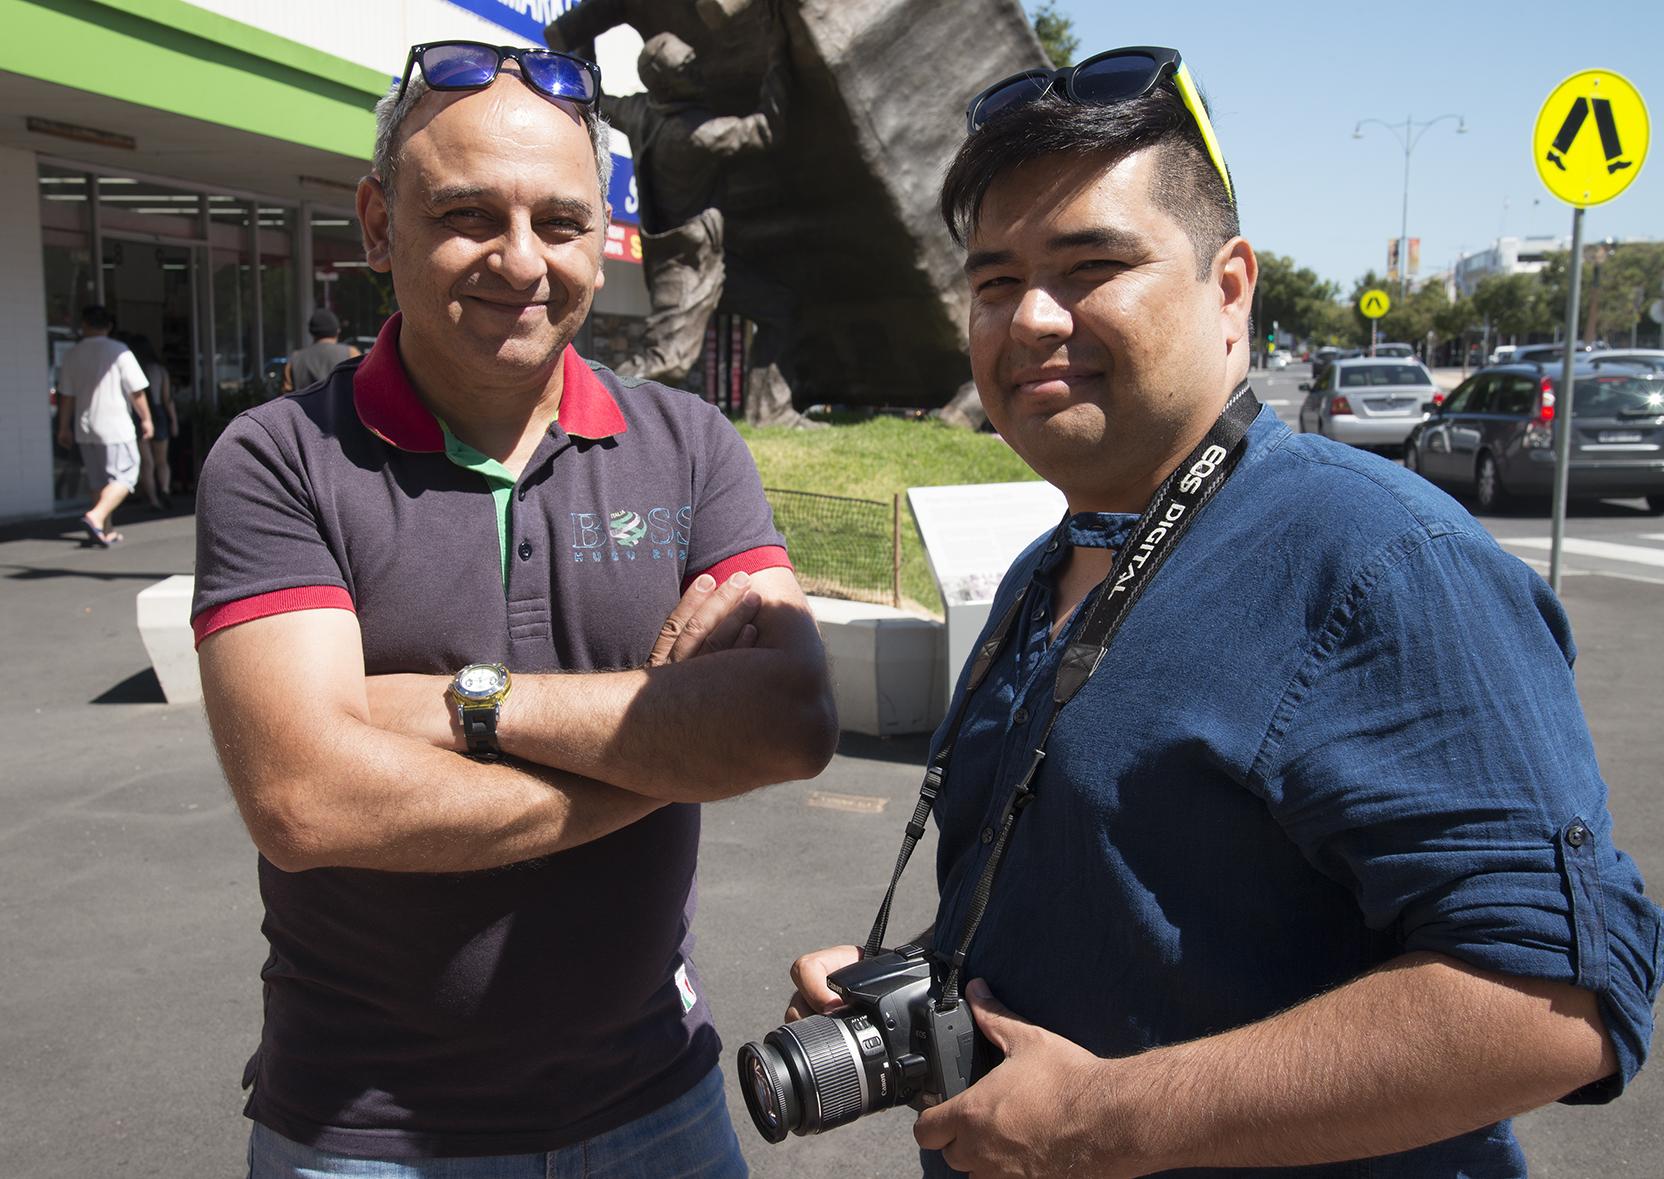 Tadros and Boman, Diversity Through The Lens participants